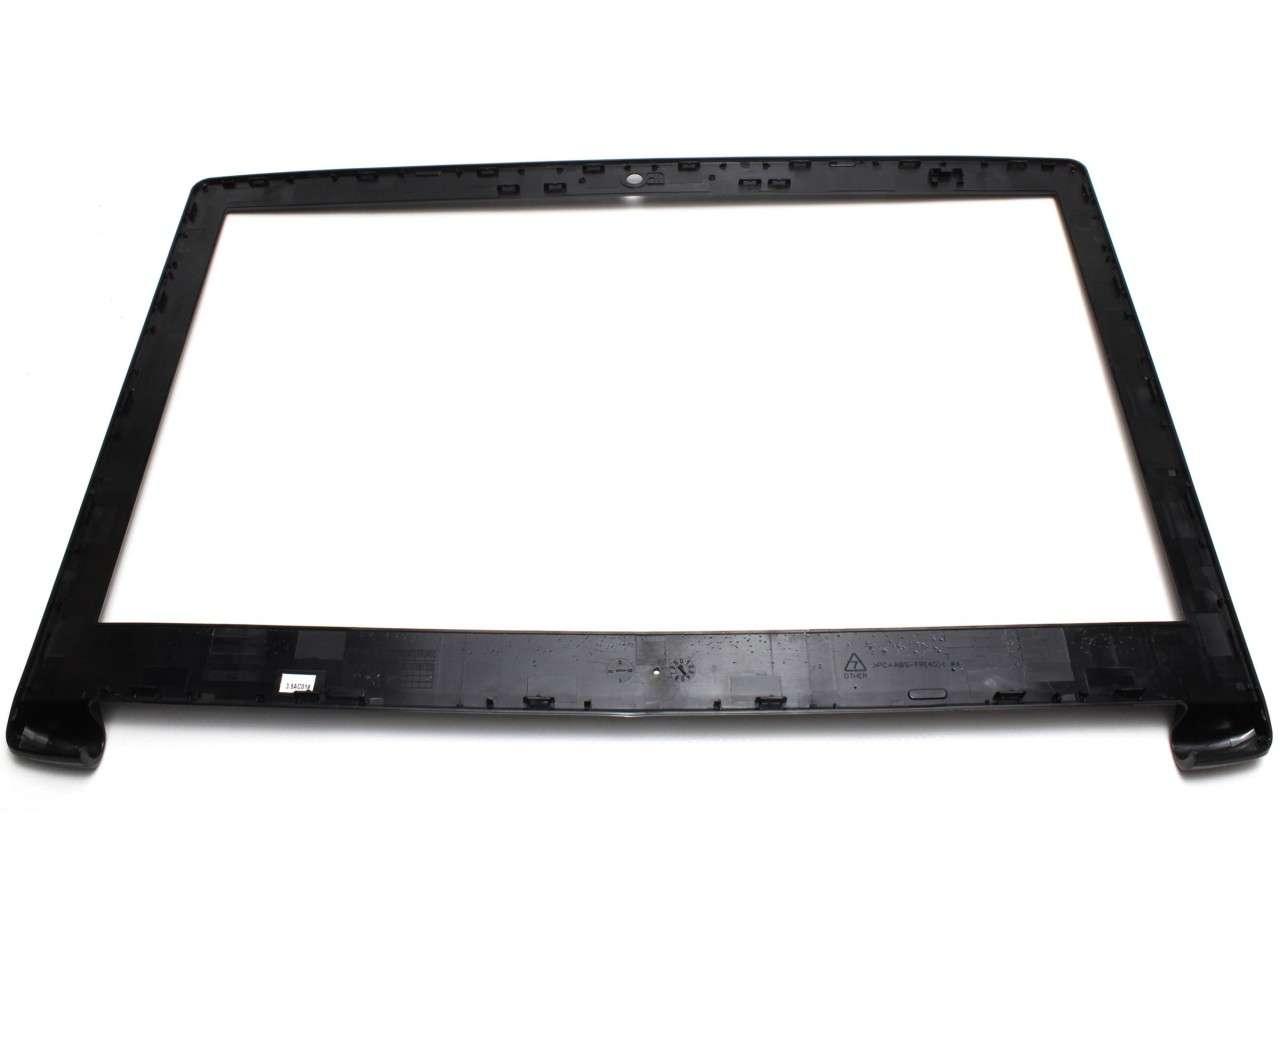 Rama Display Acer Aspire A315-41 Bezel Front Cover Neagra imagine powerlaptop.ro 2021